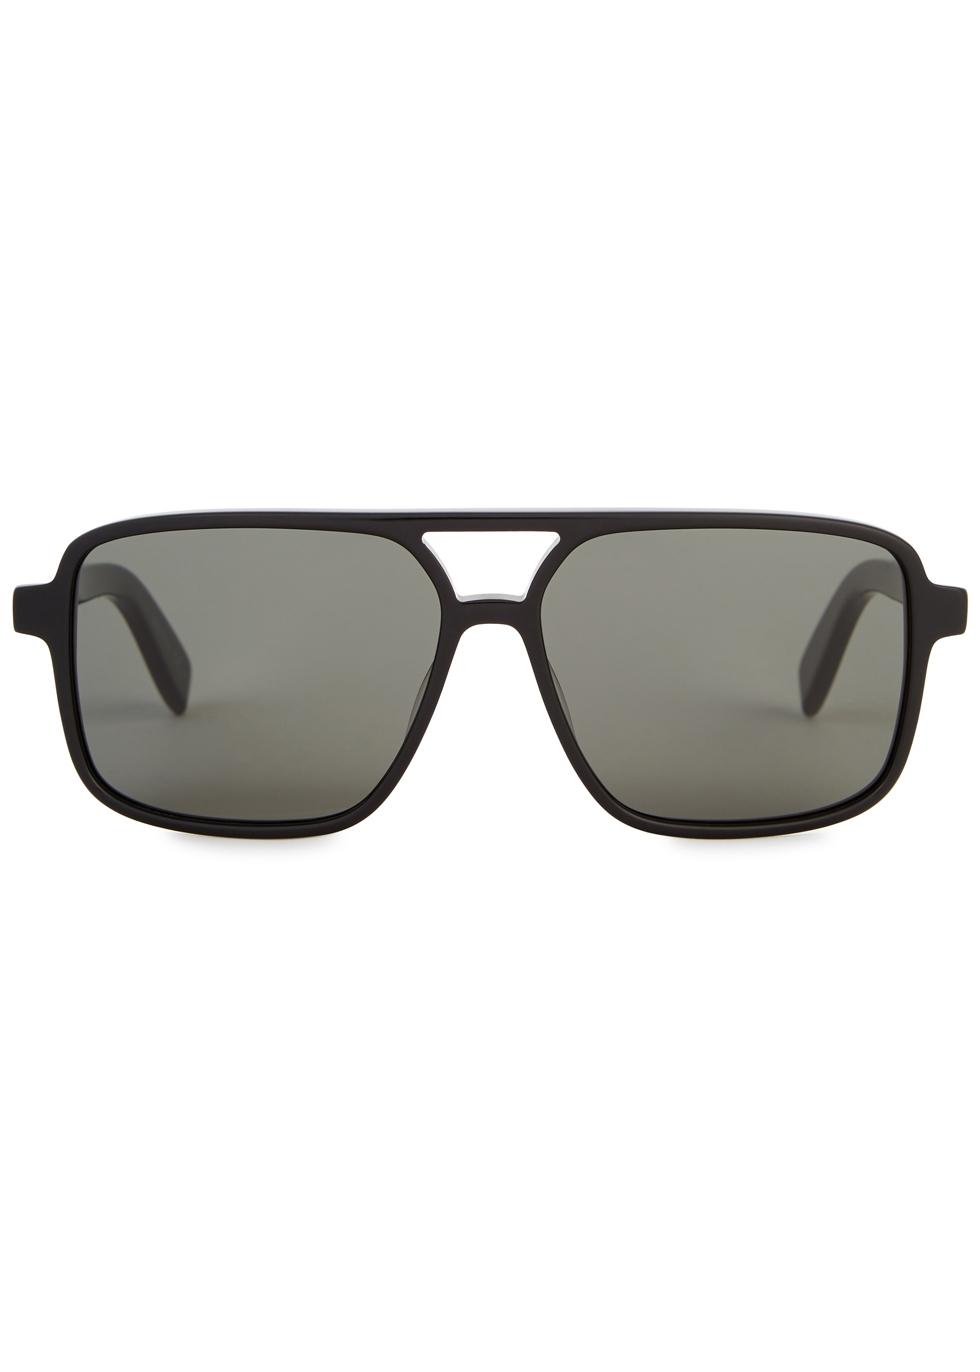 SL176 black D-frame sunglasses - Saint Laurent